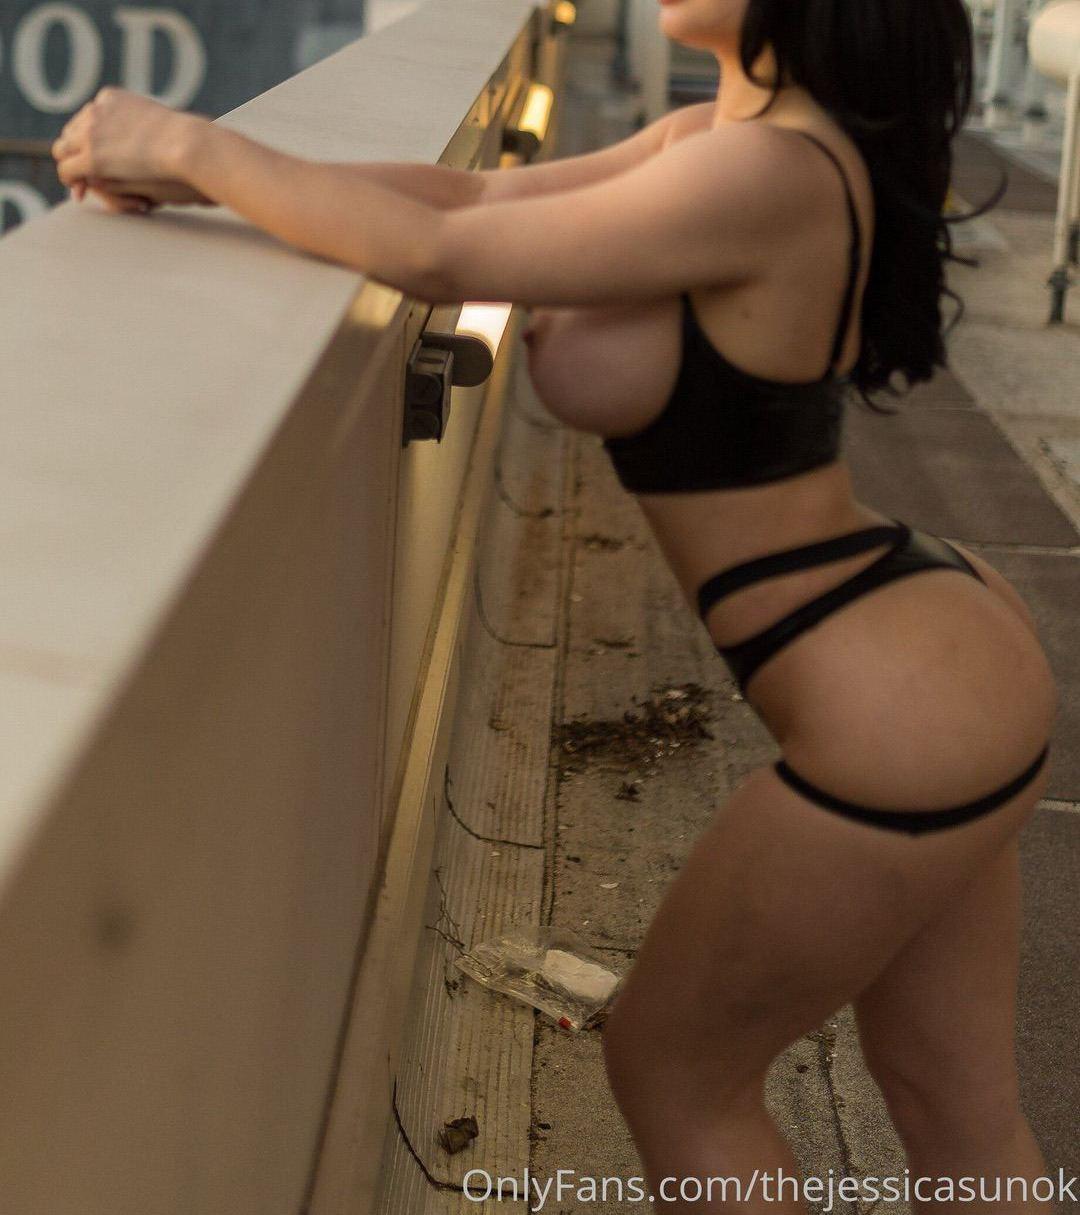 Jessica Sunok Jessicasunok Onlyfans Nudes Leaks 0006